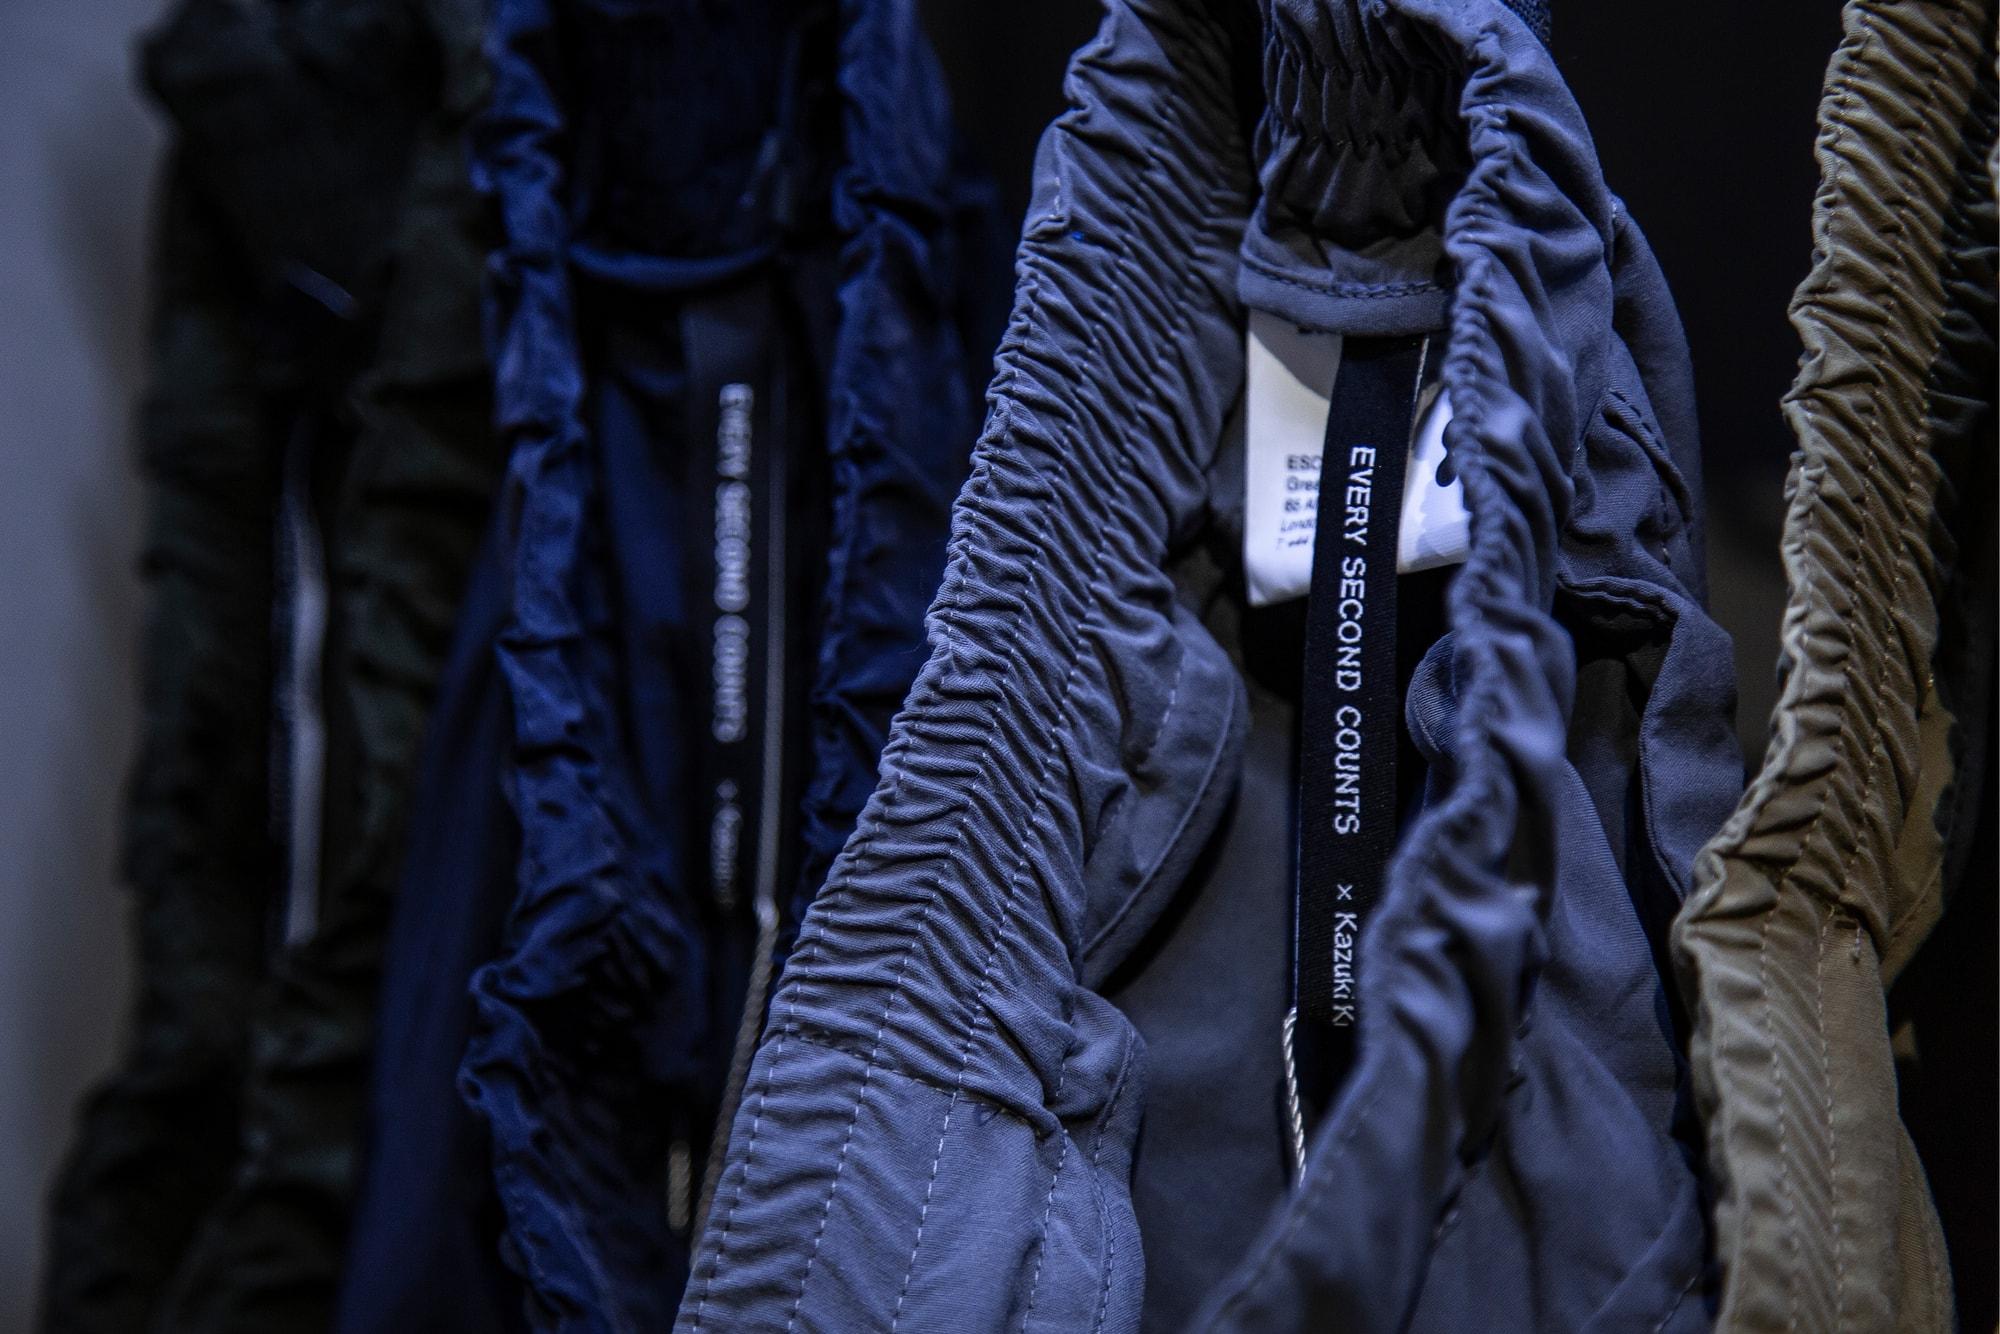 A Conversation with Kazuki Kuraishi x ESC Every Second Counts Japan Tokyo Streetwear Nigo Hiroshi Fujiwara Hokkaido A Bathing Ape adidas NBHD Shinsuke Takizawa WTAPS A.Four Labs Fourness Heather Grey Wall